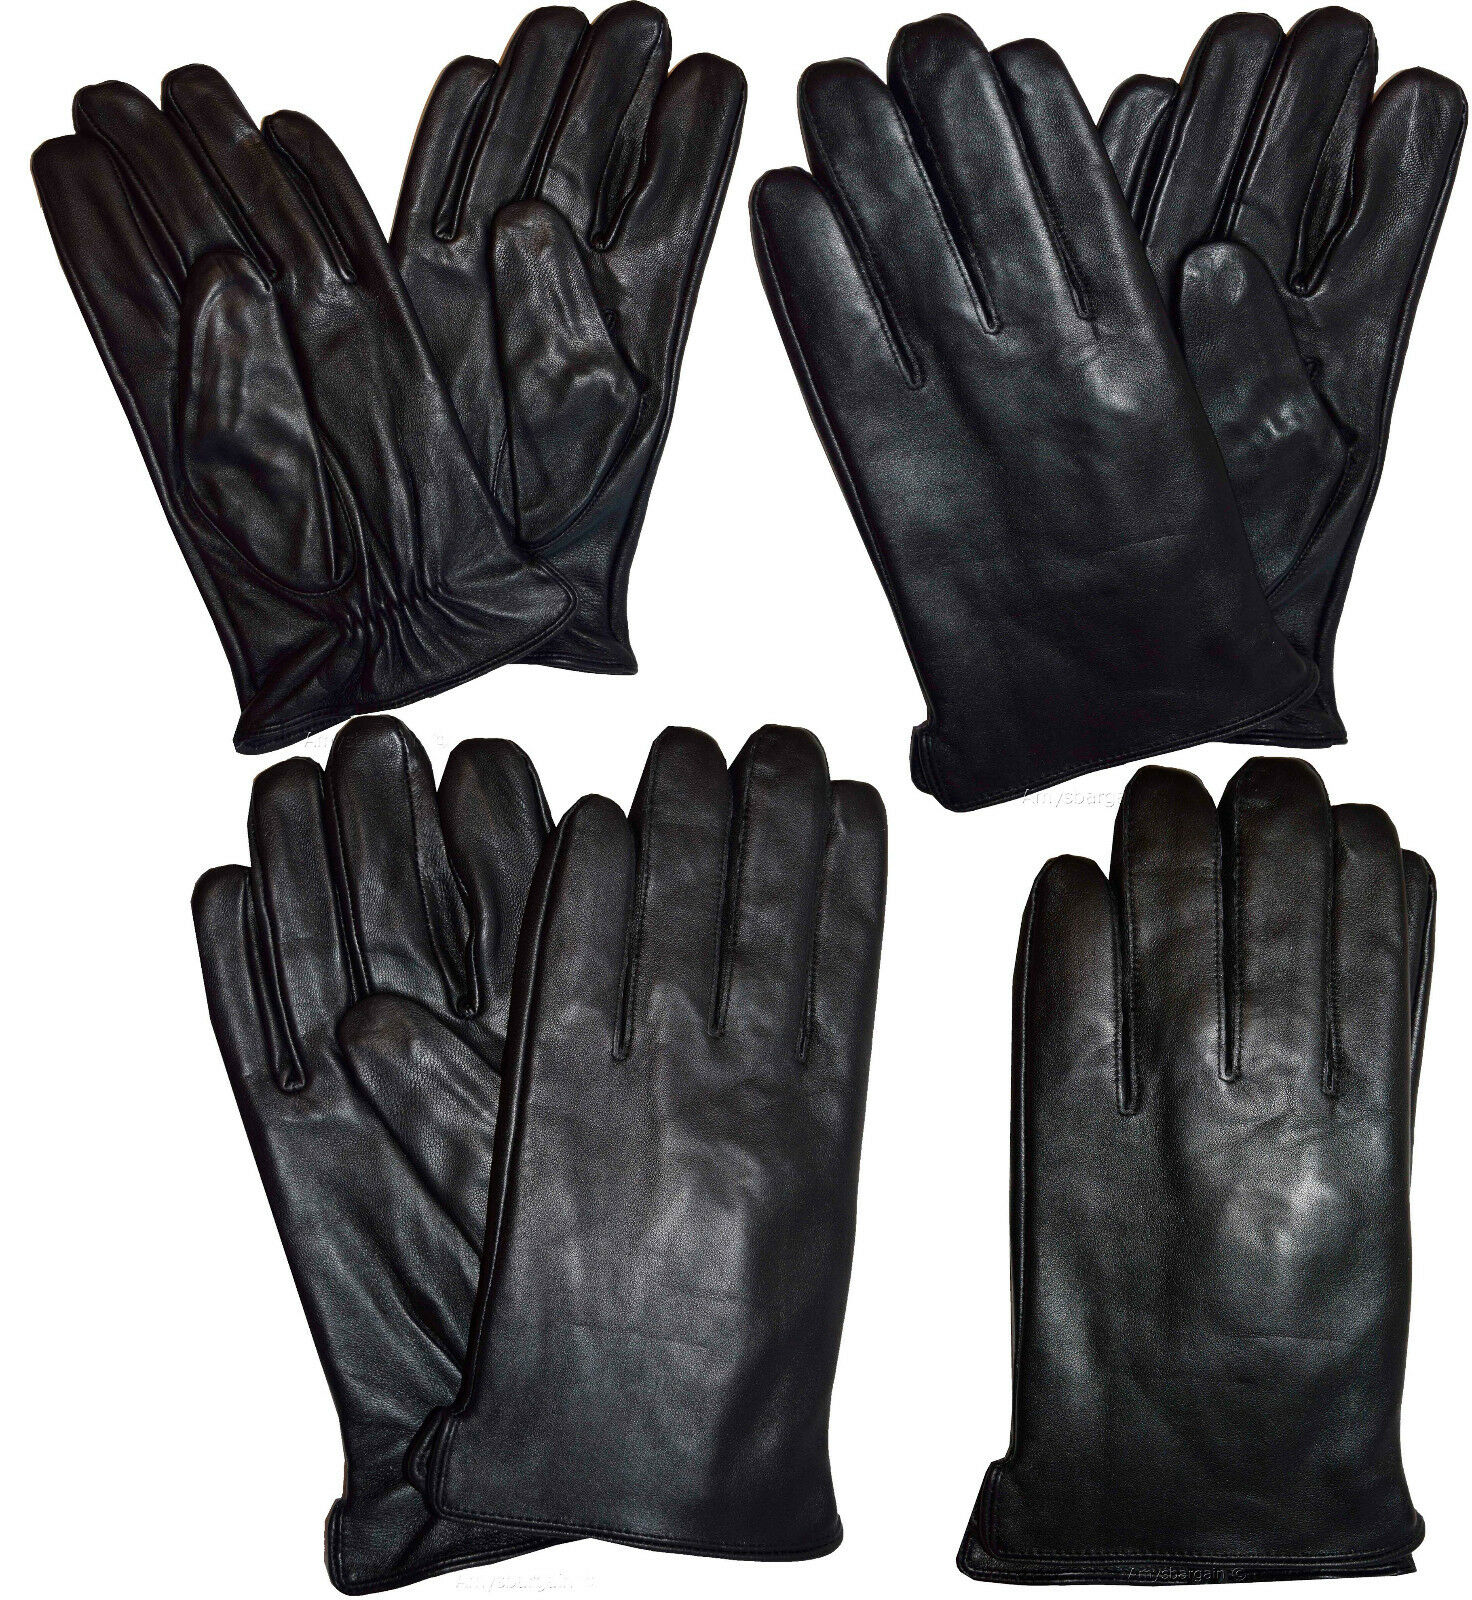 Mens leather gloves xl - Men S Leather Gloves Size Xl Dress Gloves Winter Gloves Warm Winter